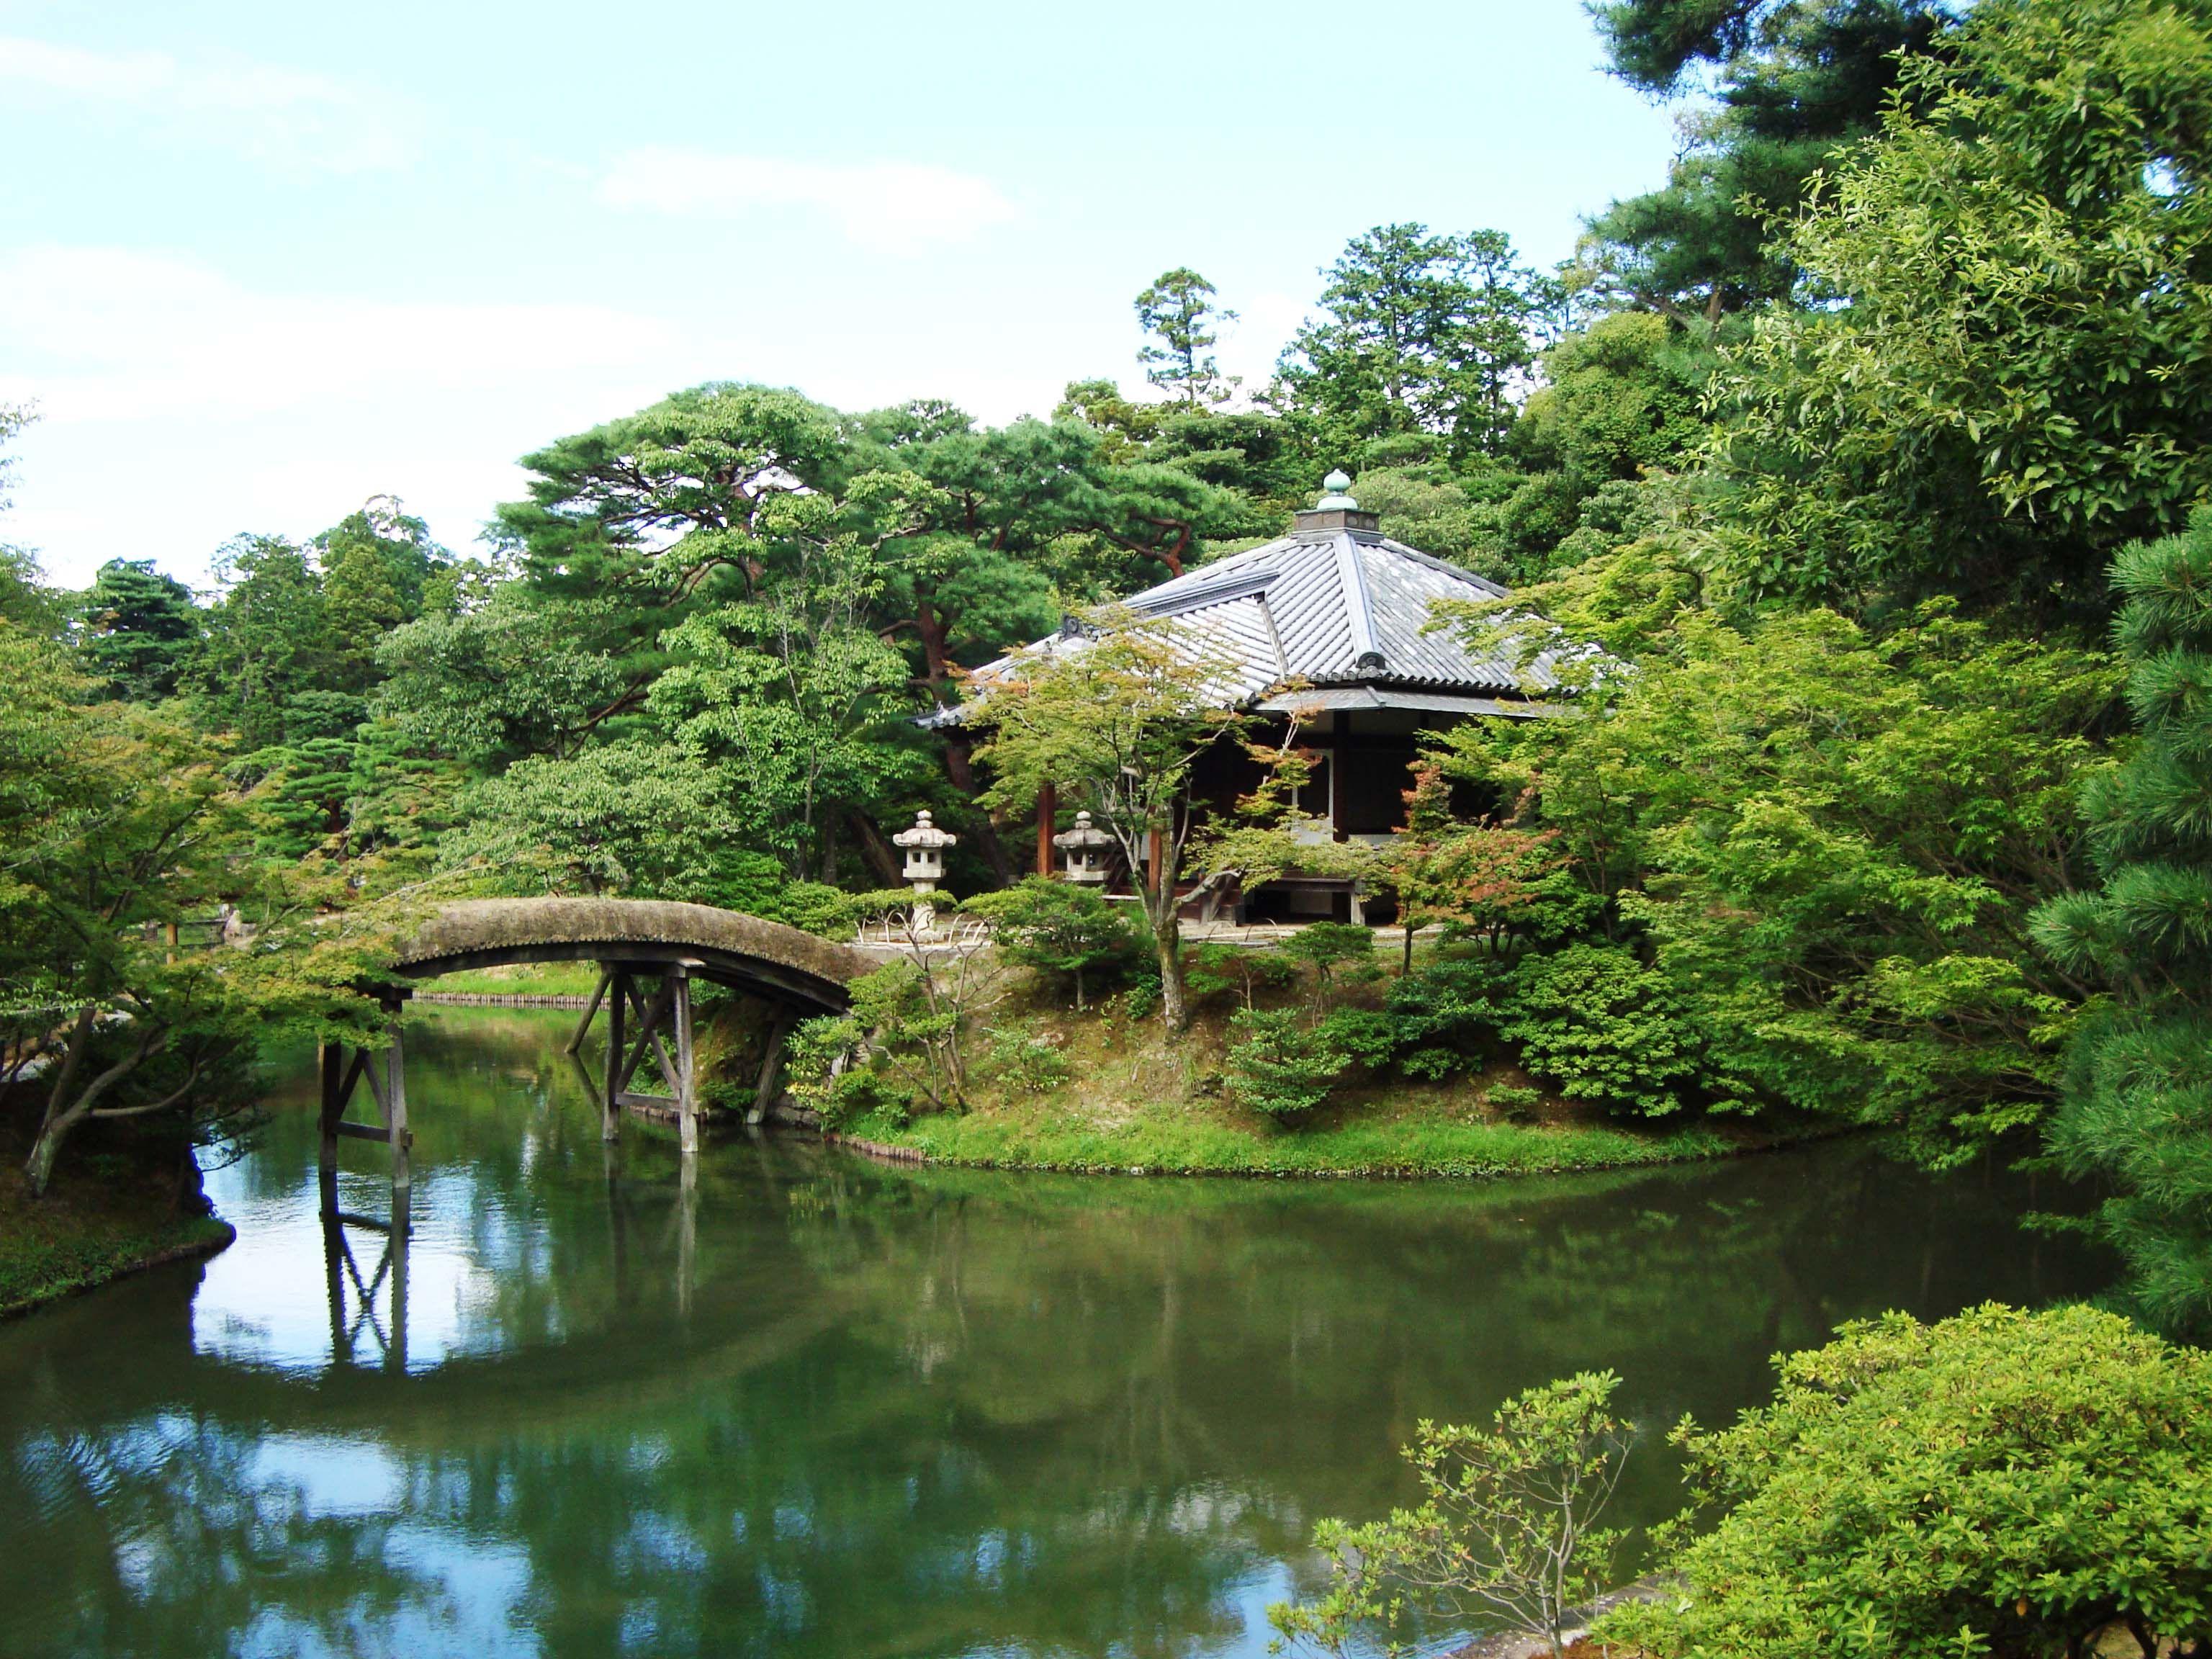 Kyoto, Japan, Katsura Imperial Villa Front Bridge